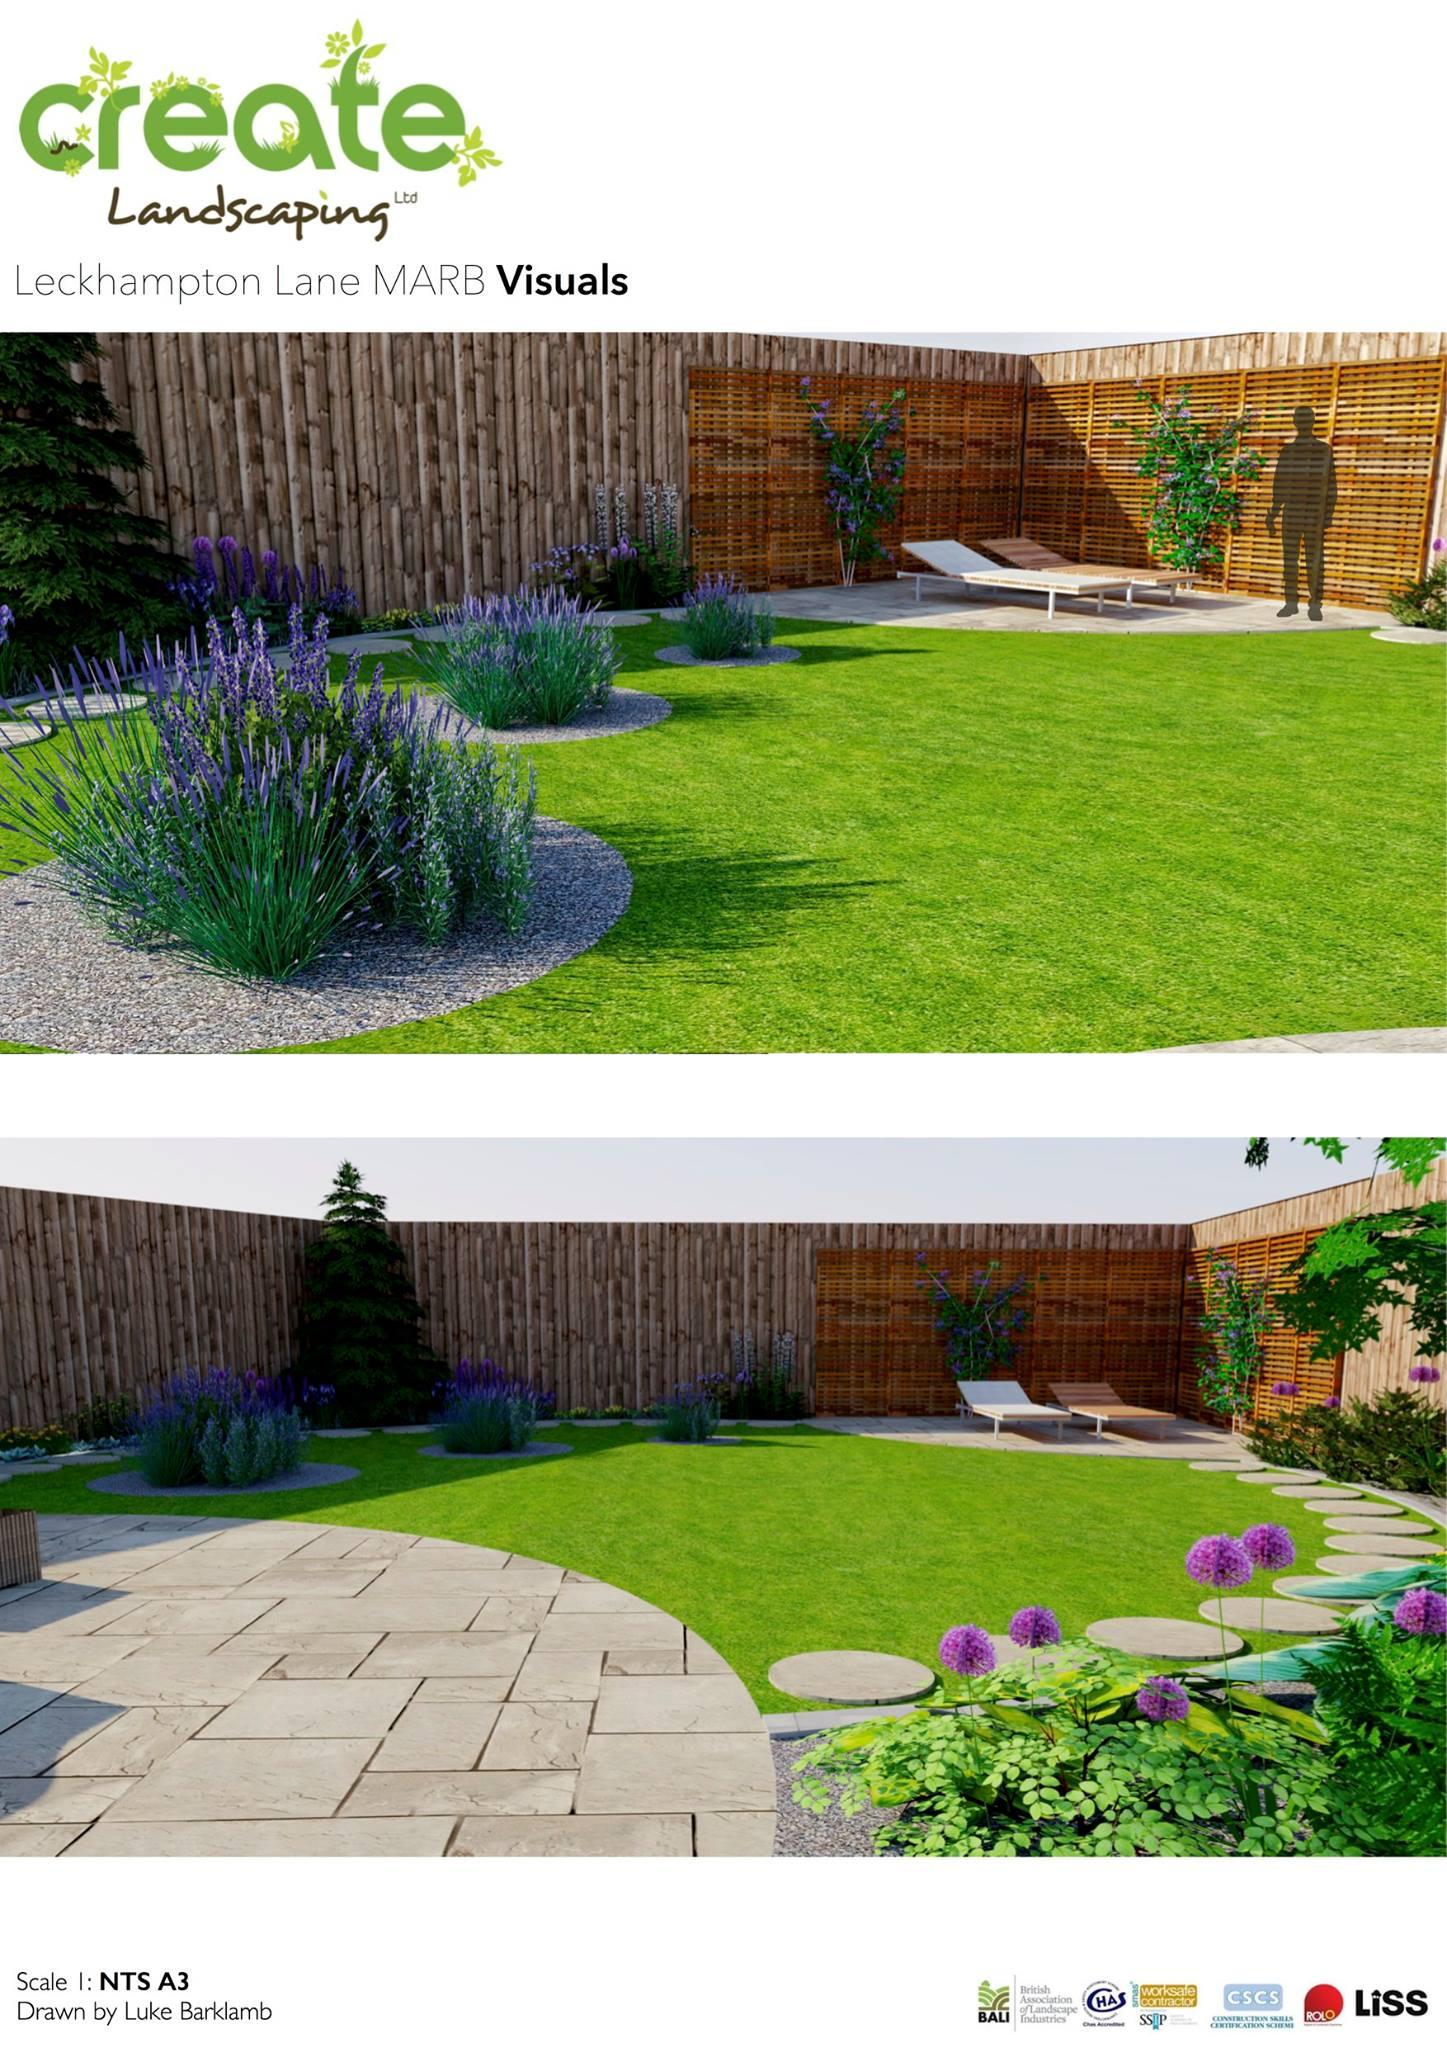 Luke barklamb latest commercial landscape design project for Landscape design creator